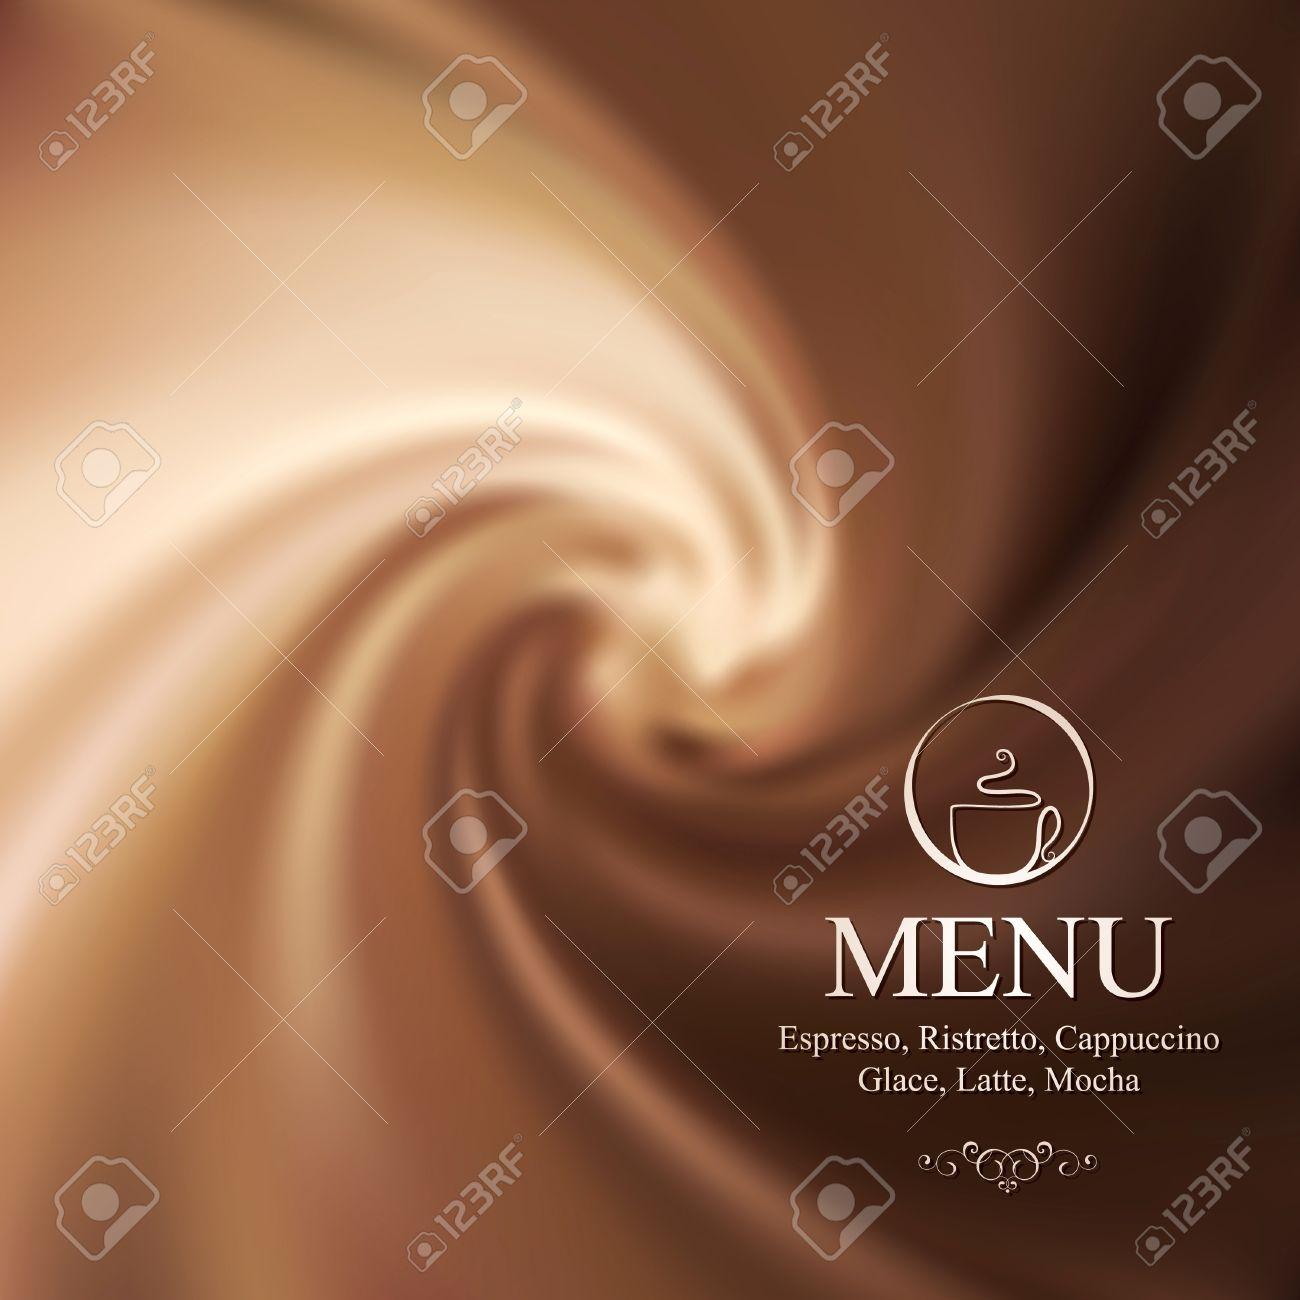 Vector menu design with milk-chocolate background Stock Vector - 10903956